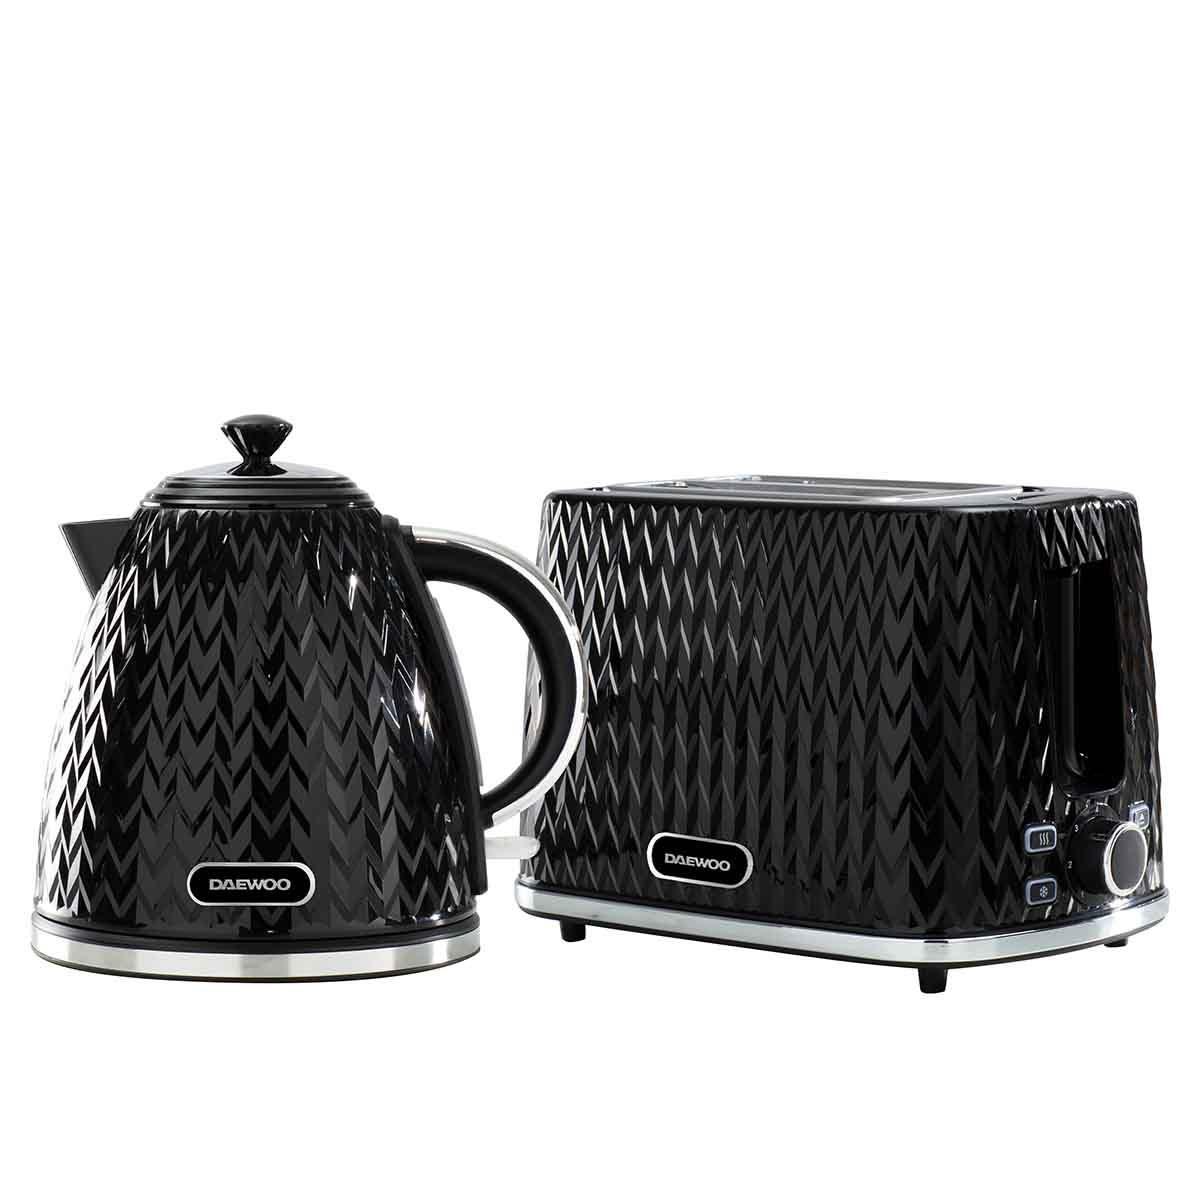 Daewoo SDA2387DS Argyle 1.7L 3KW Jug Kettle and 2 Slice Toaster Set - Black